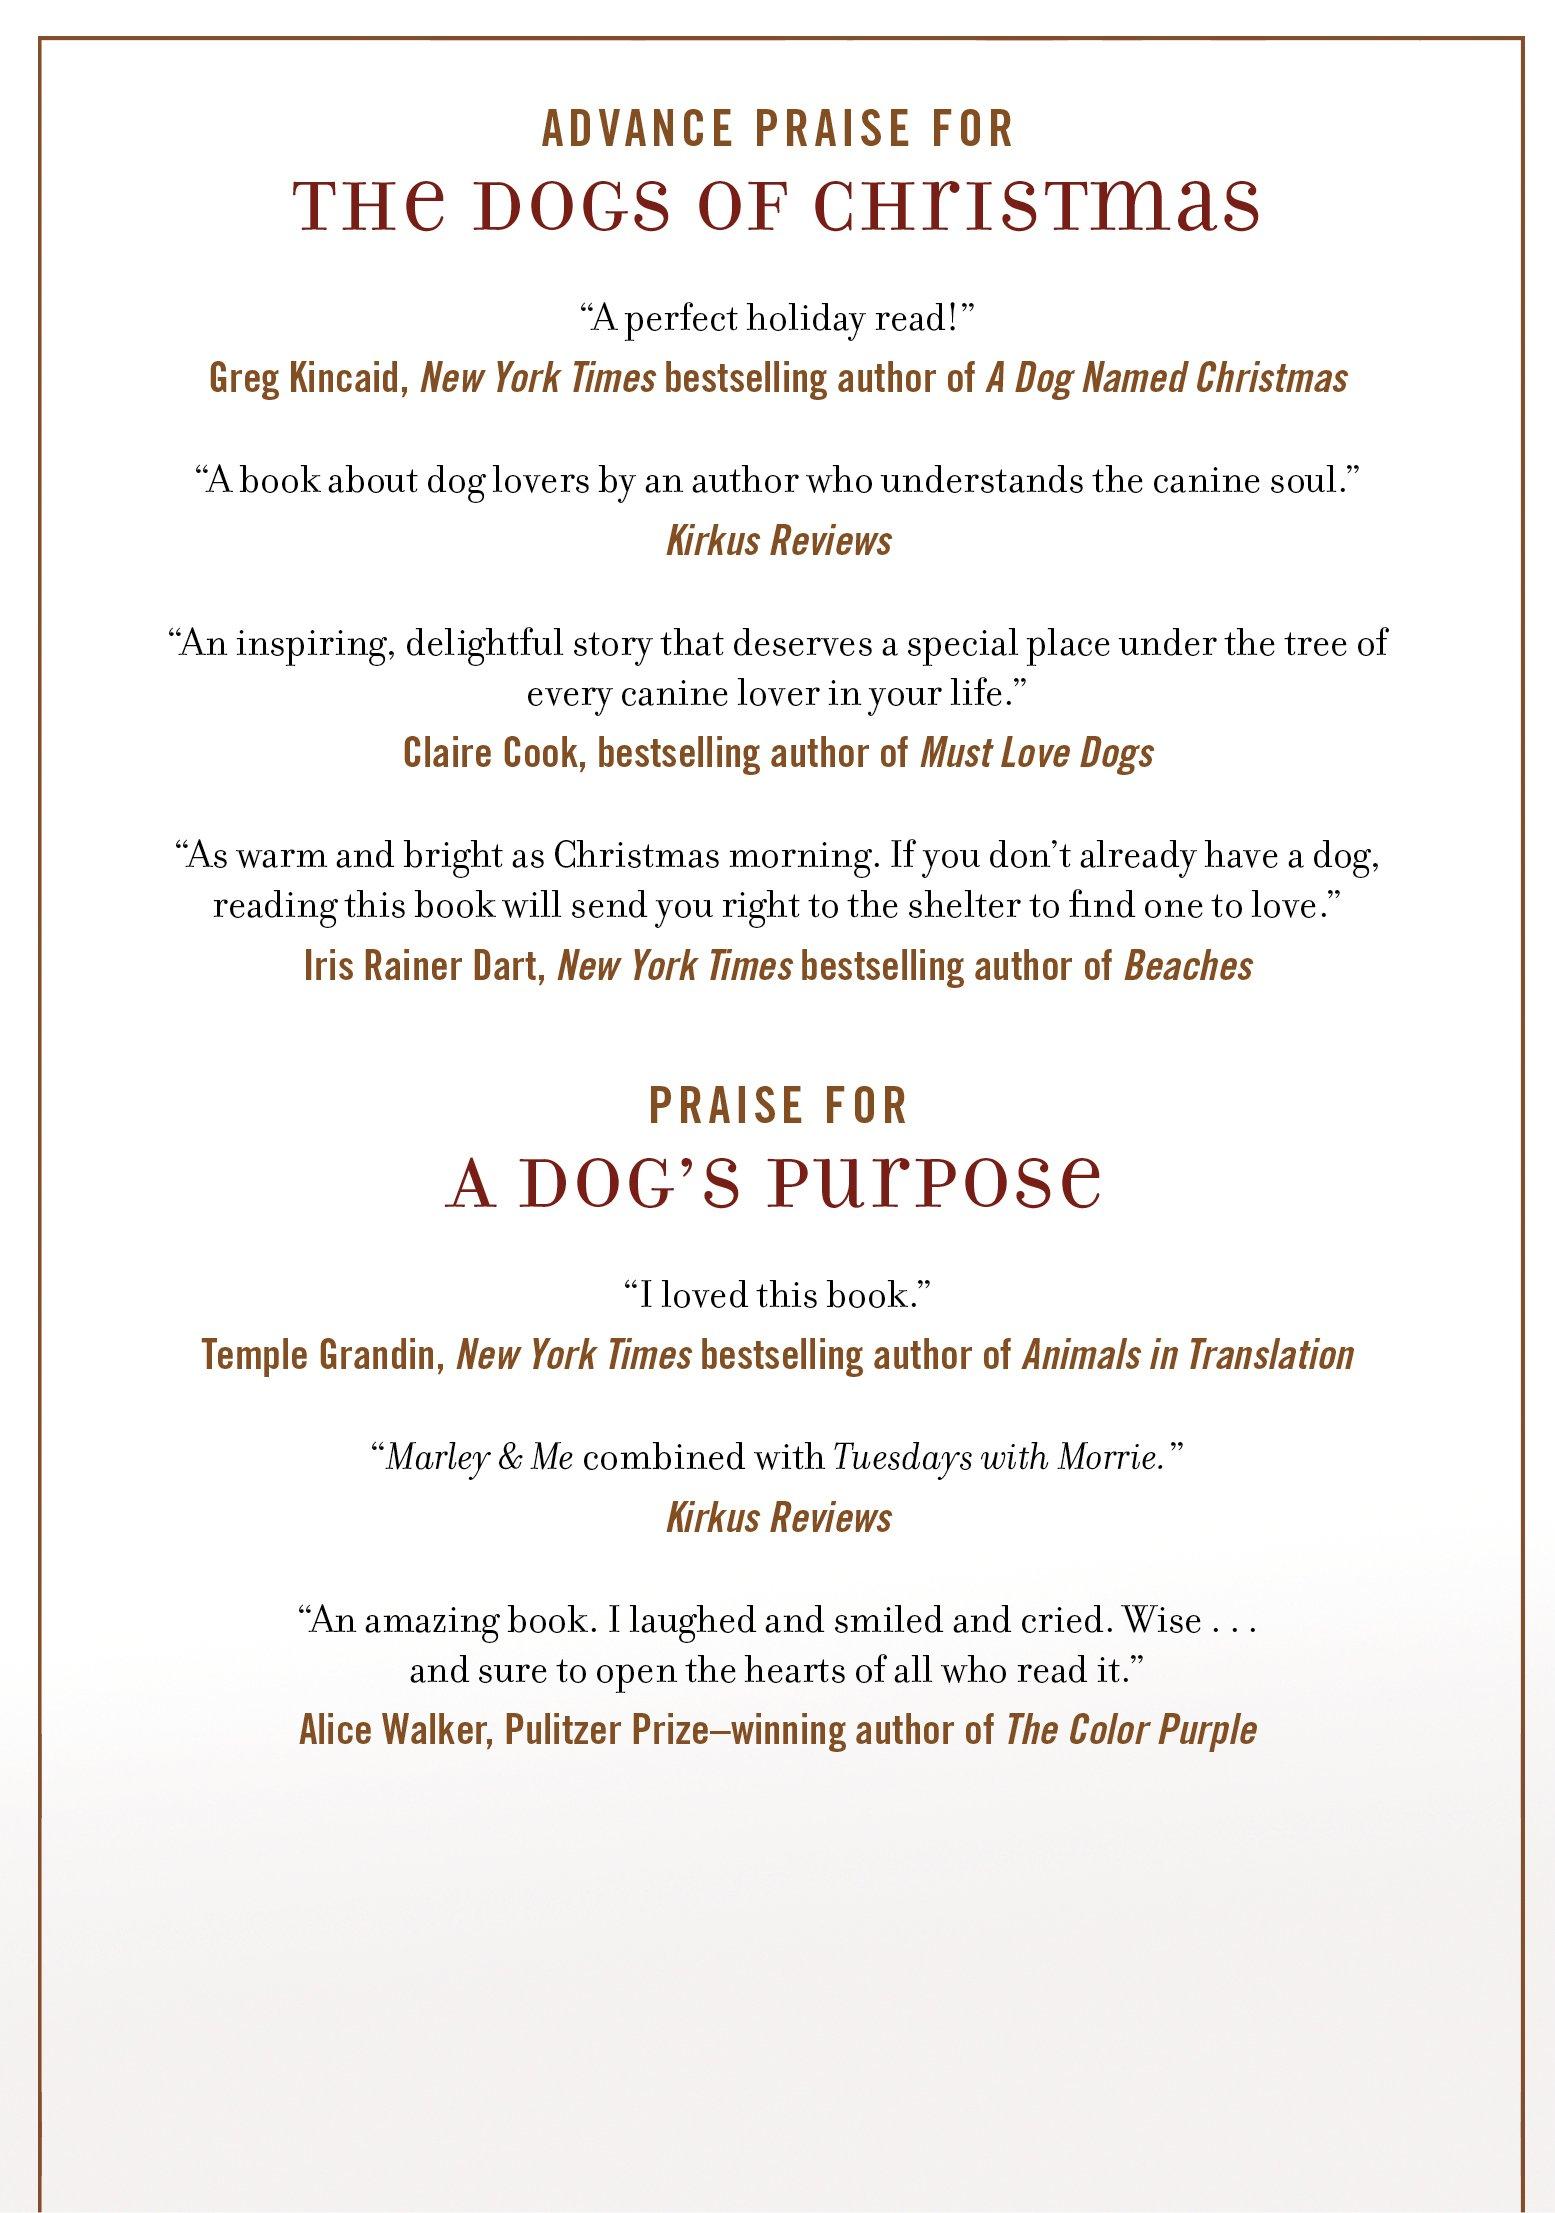 Amazon.com: The Dogs of Christmas (9780765330550): W. Bruce Cameron ...